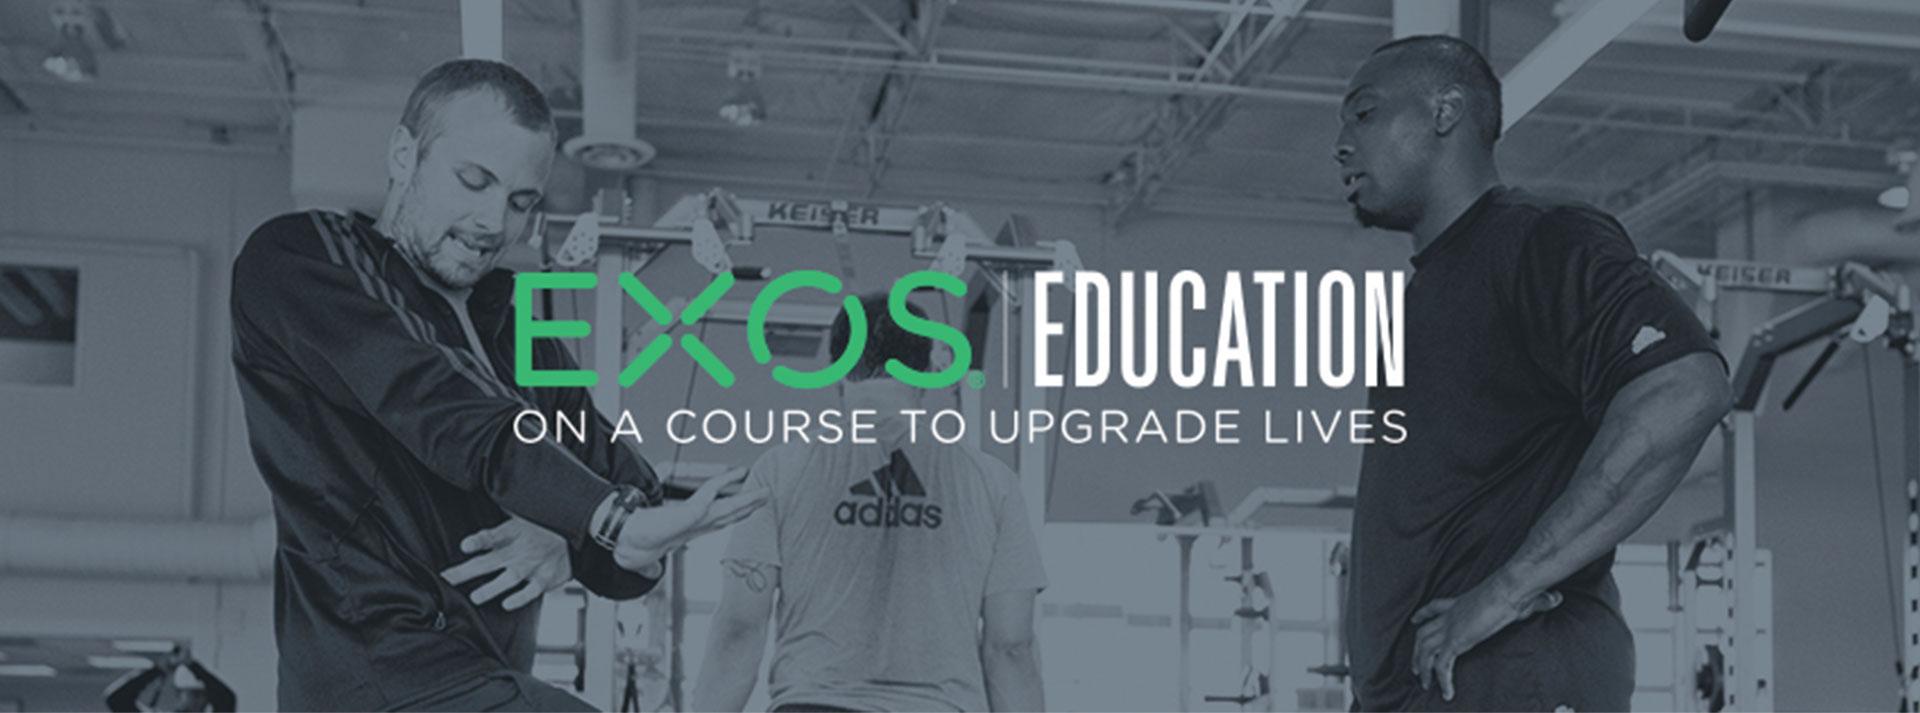 Exos on site courses